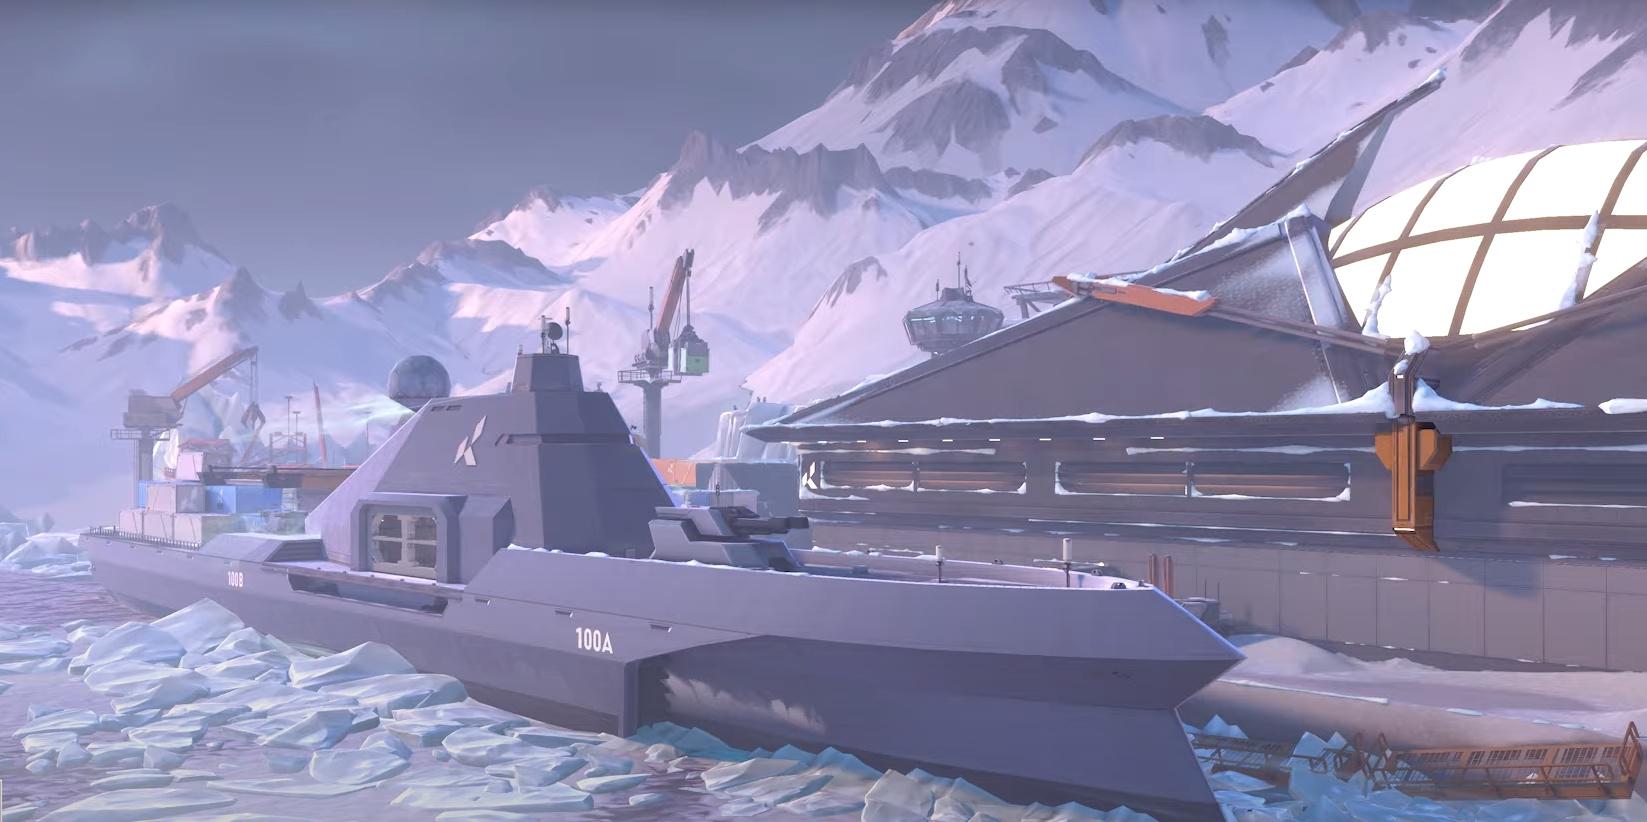 Создатели Valorant показали новую карту — Icebox